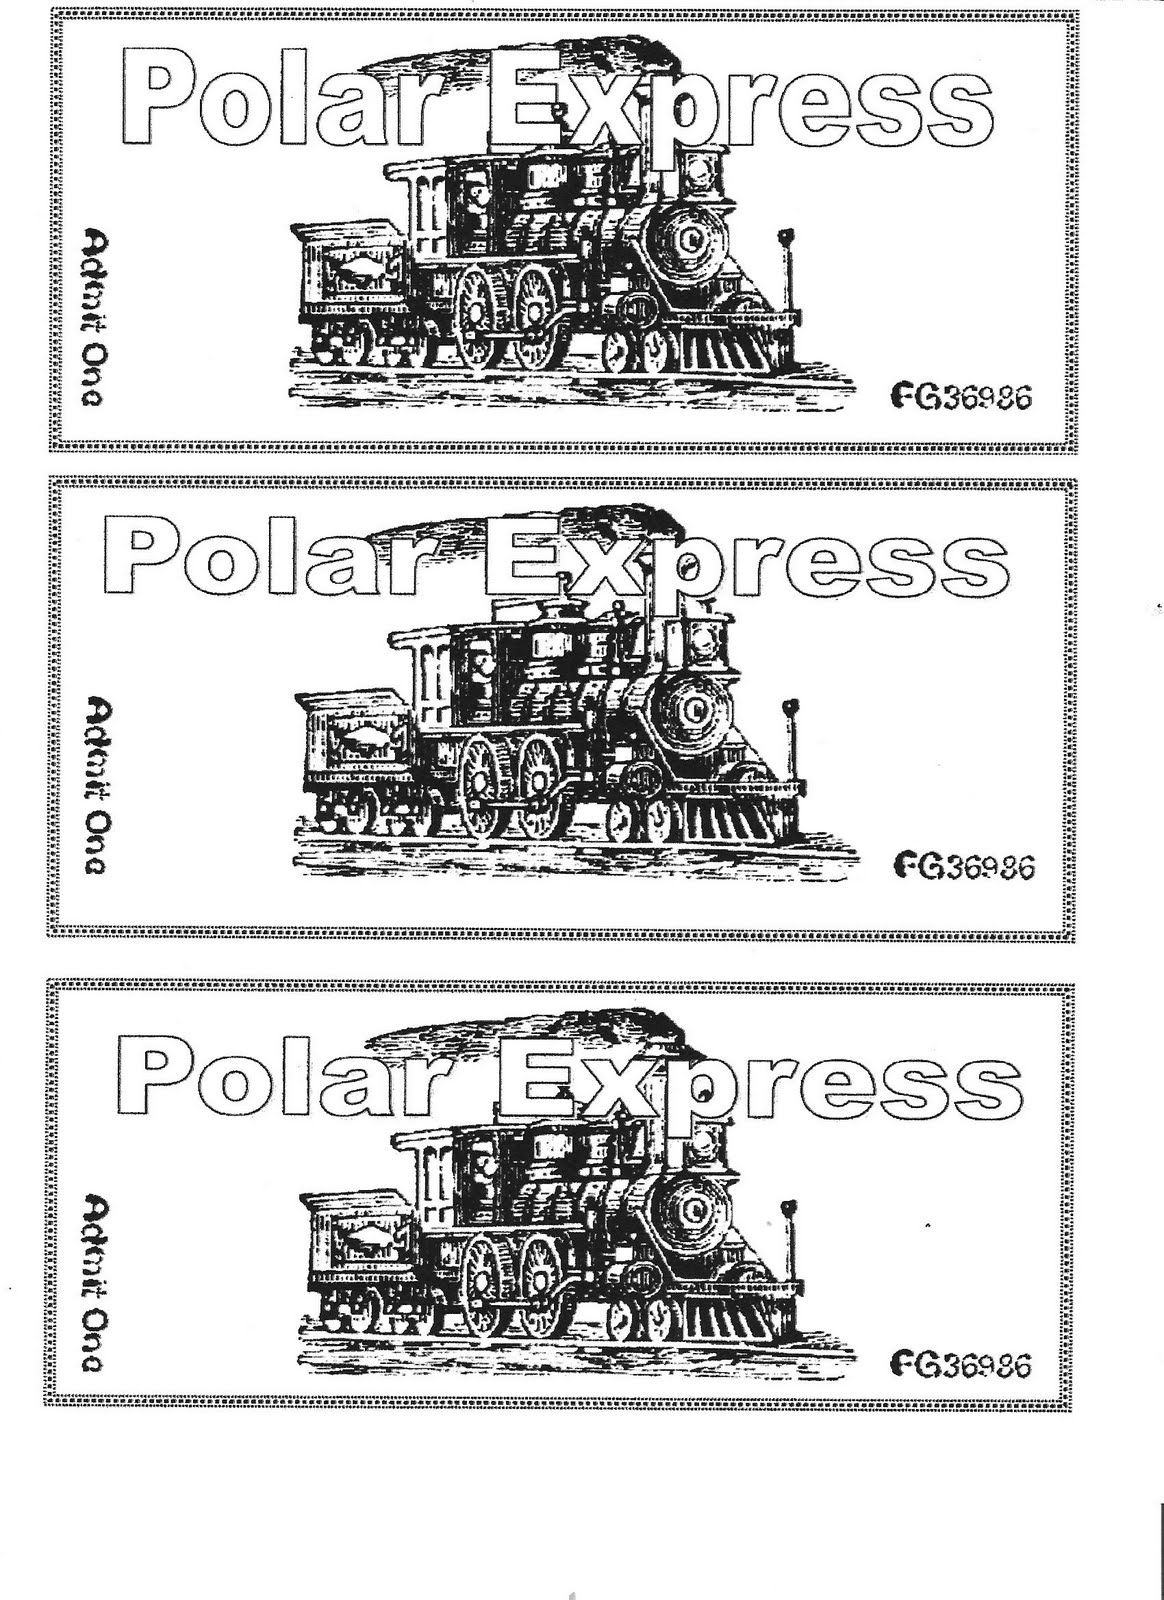 Polar Express Tickets | School | Pinterest | Proyectos para niños ...